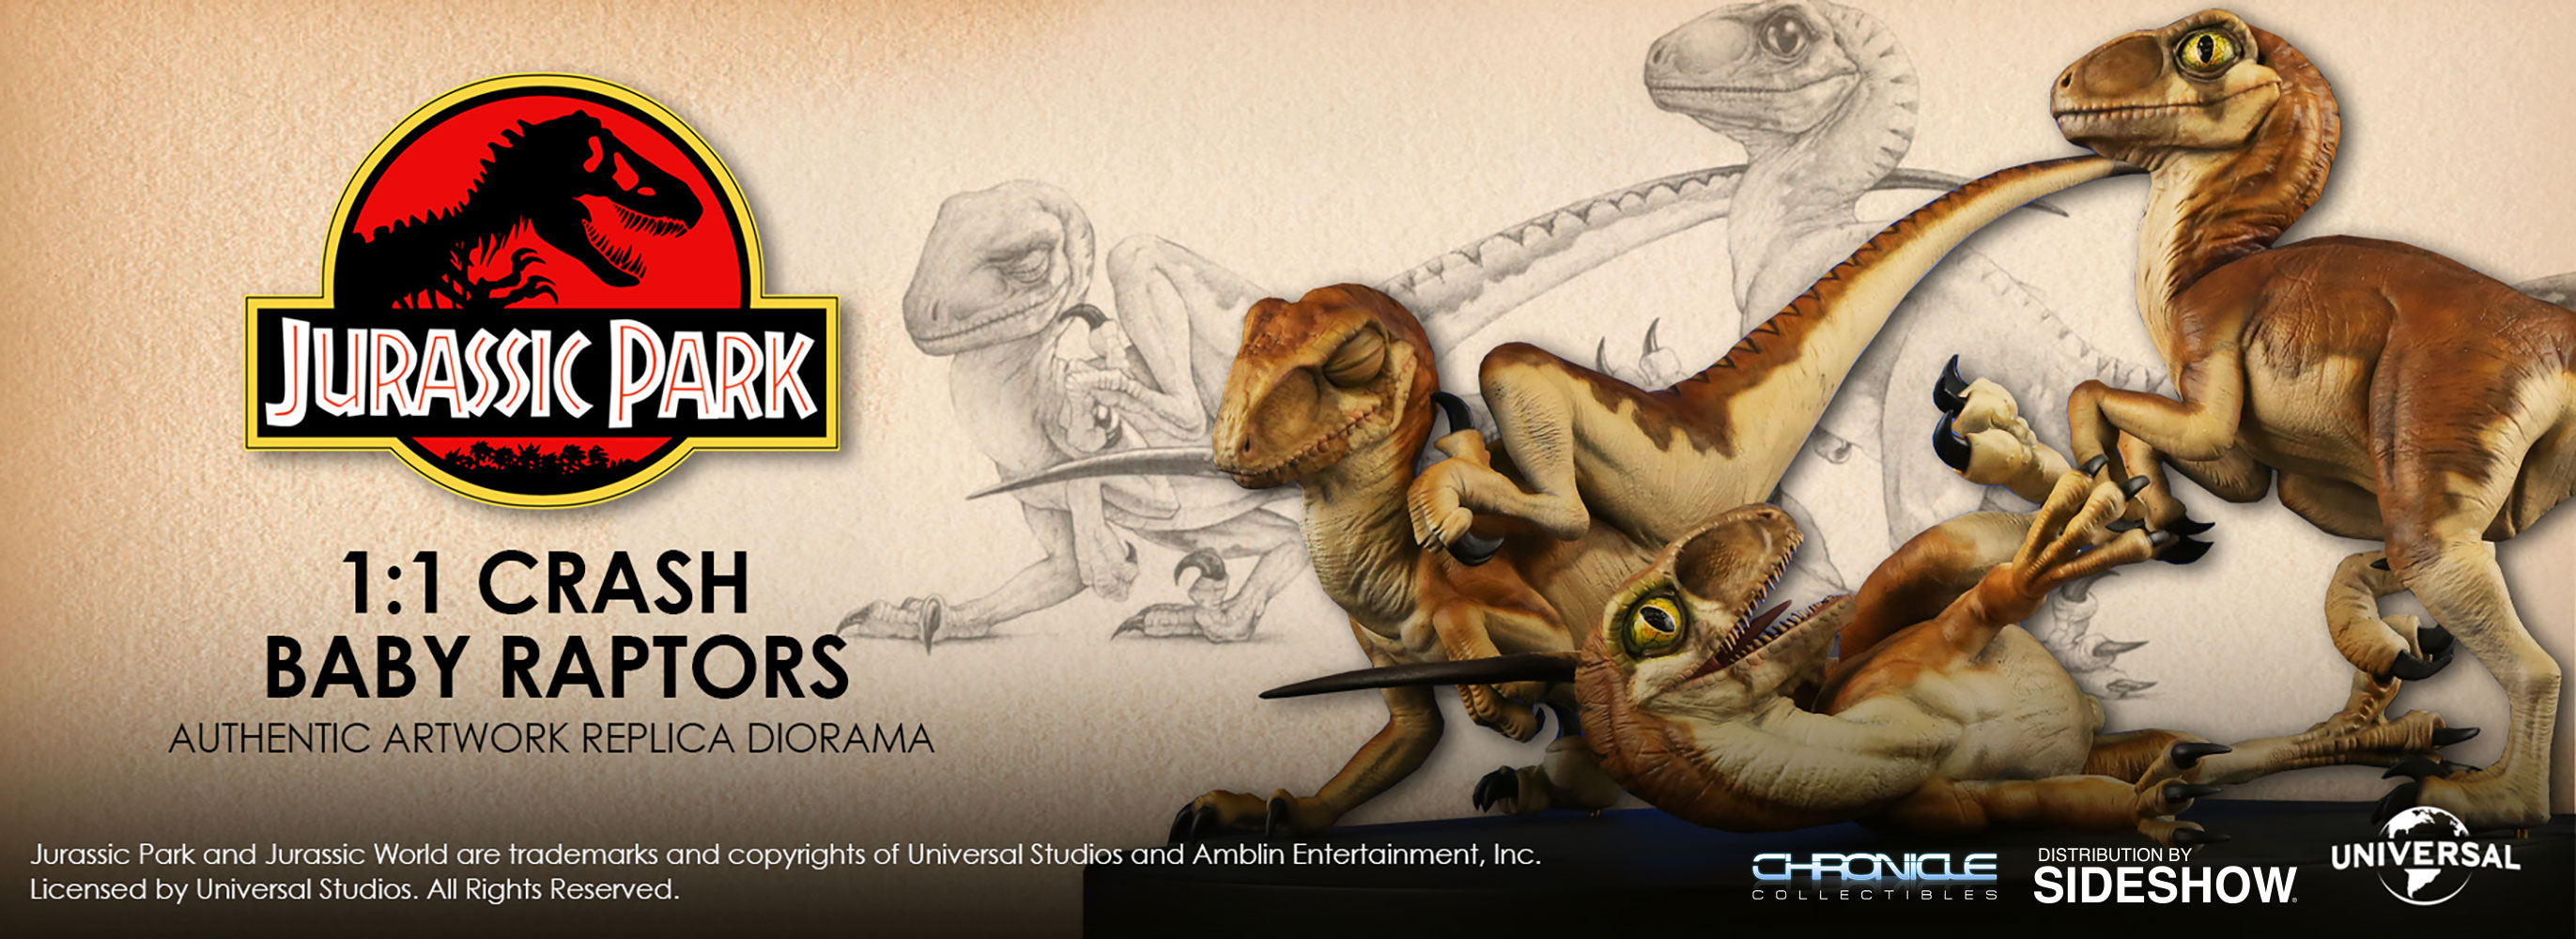 Jurassic Park Crash McCreery's Baby Raptors